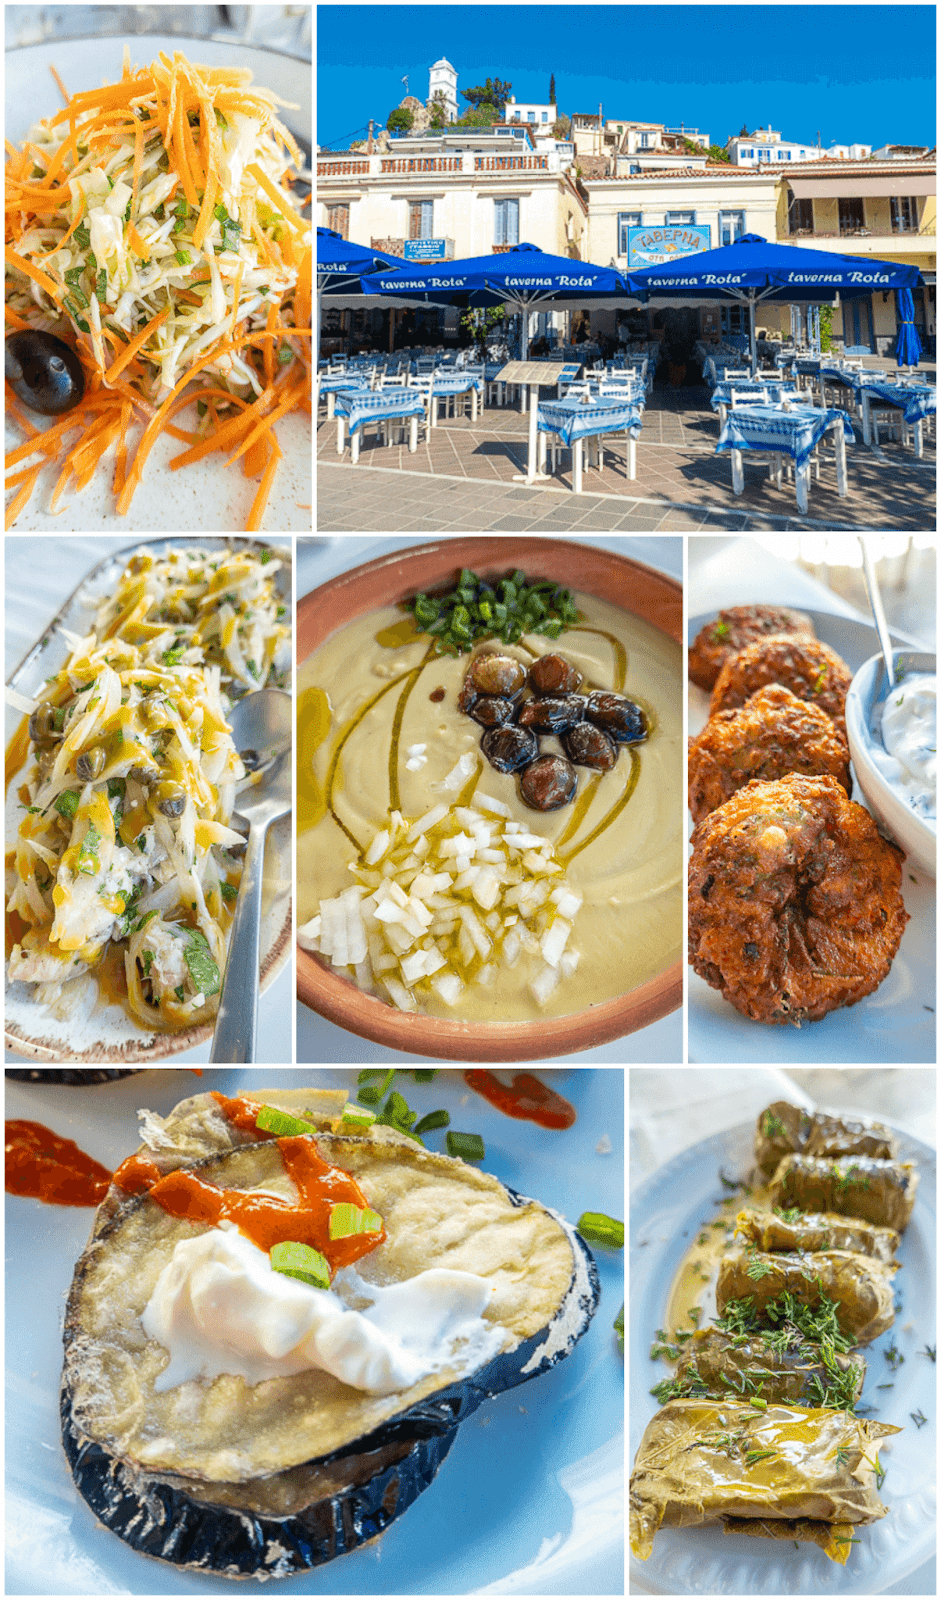 Lunch at Taverna Rota in Poros Greece